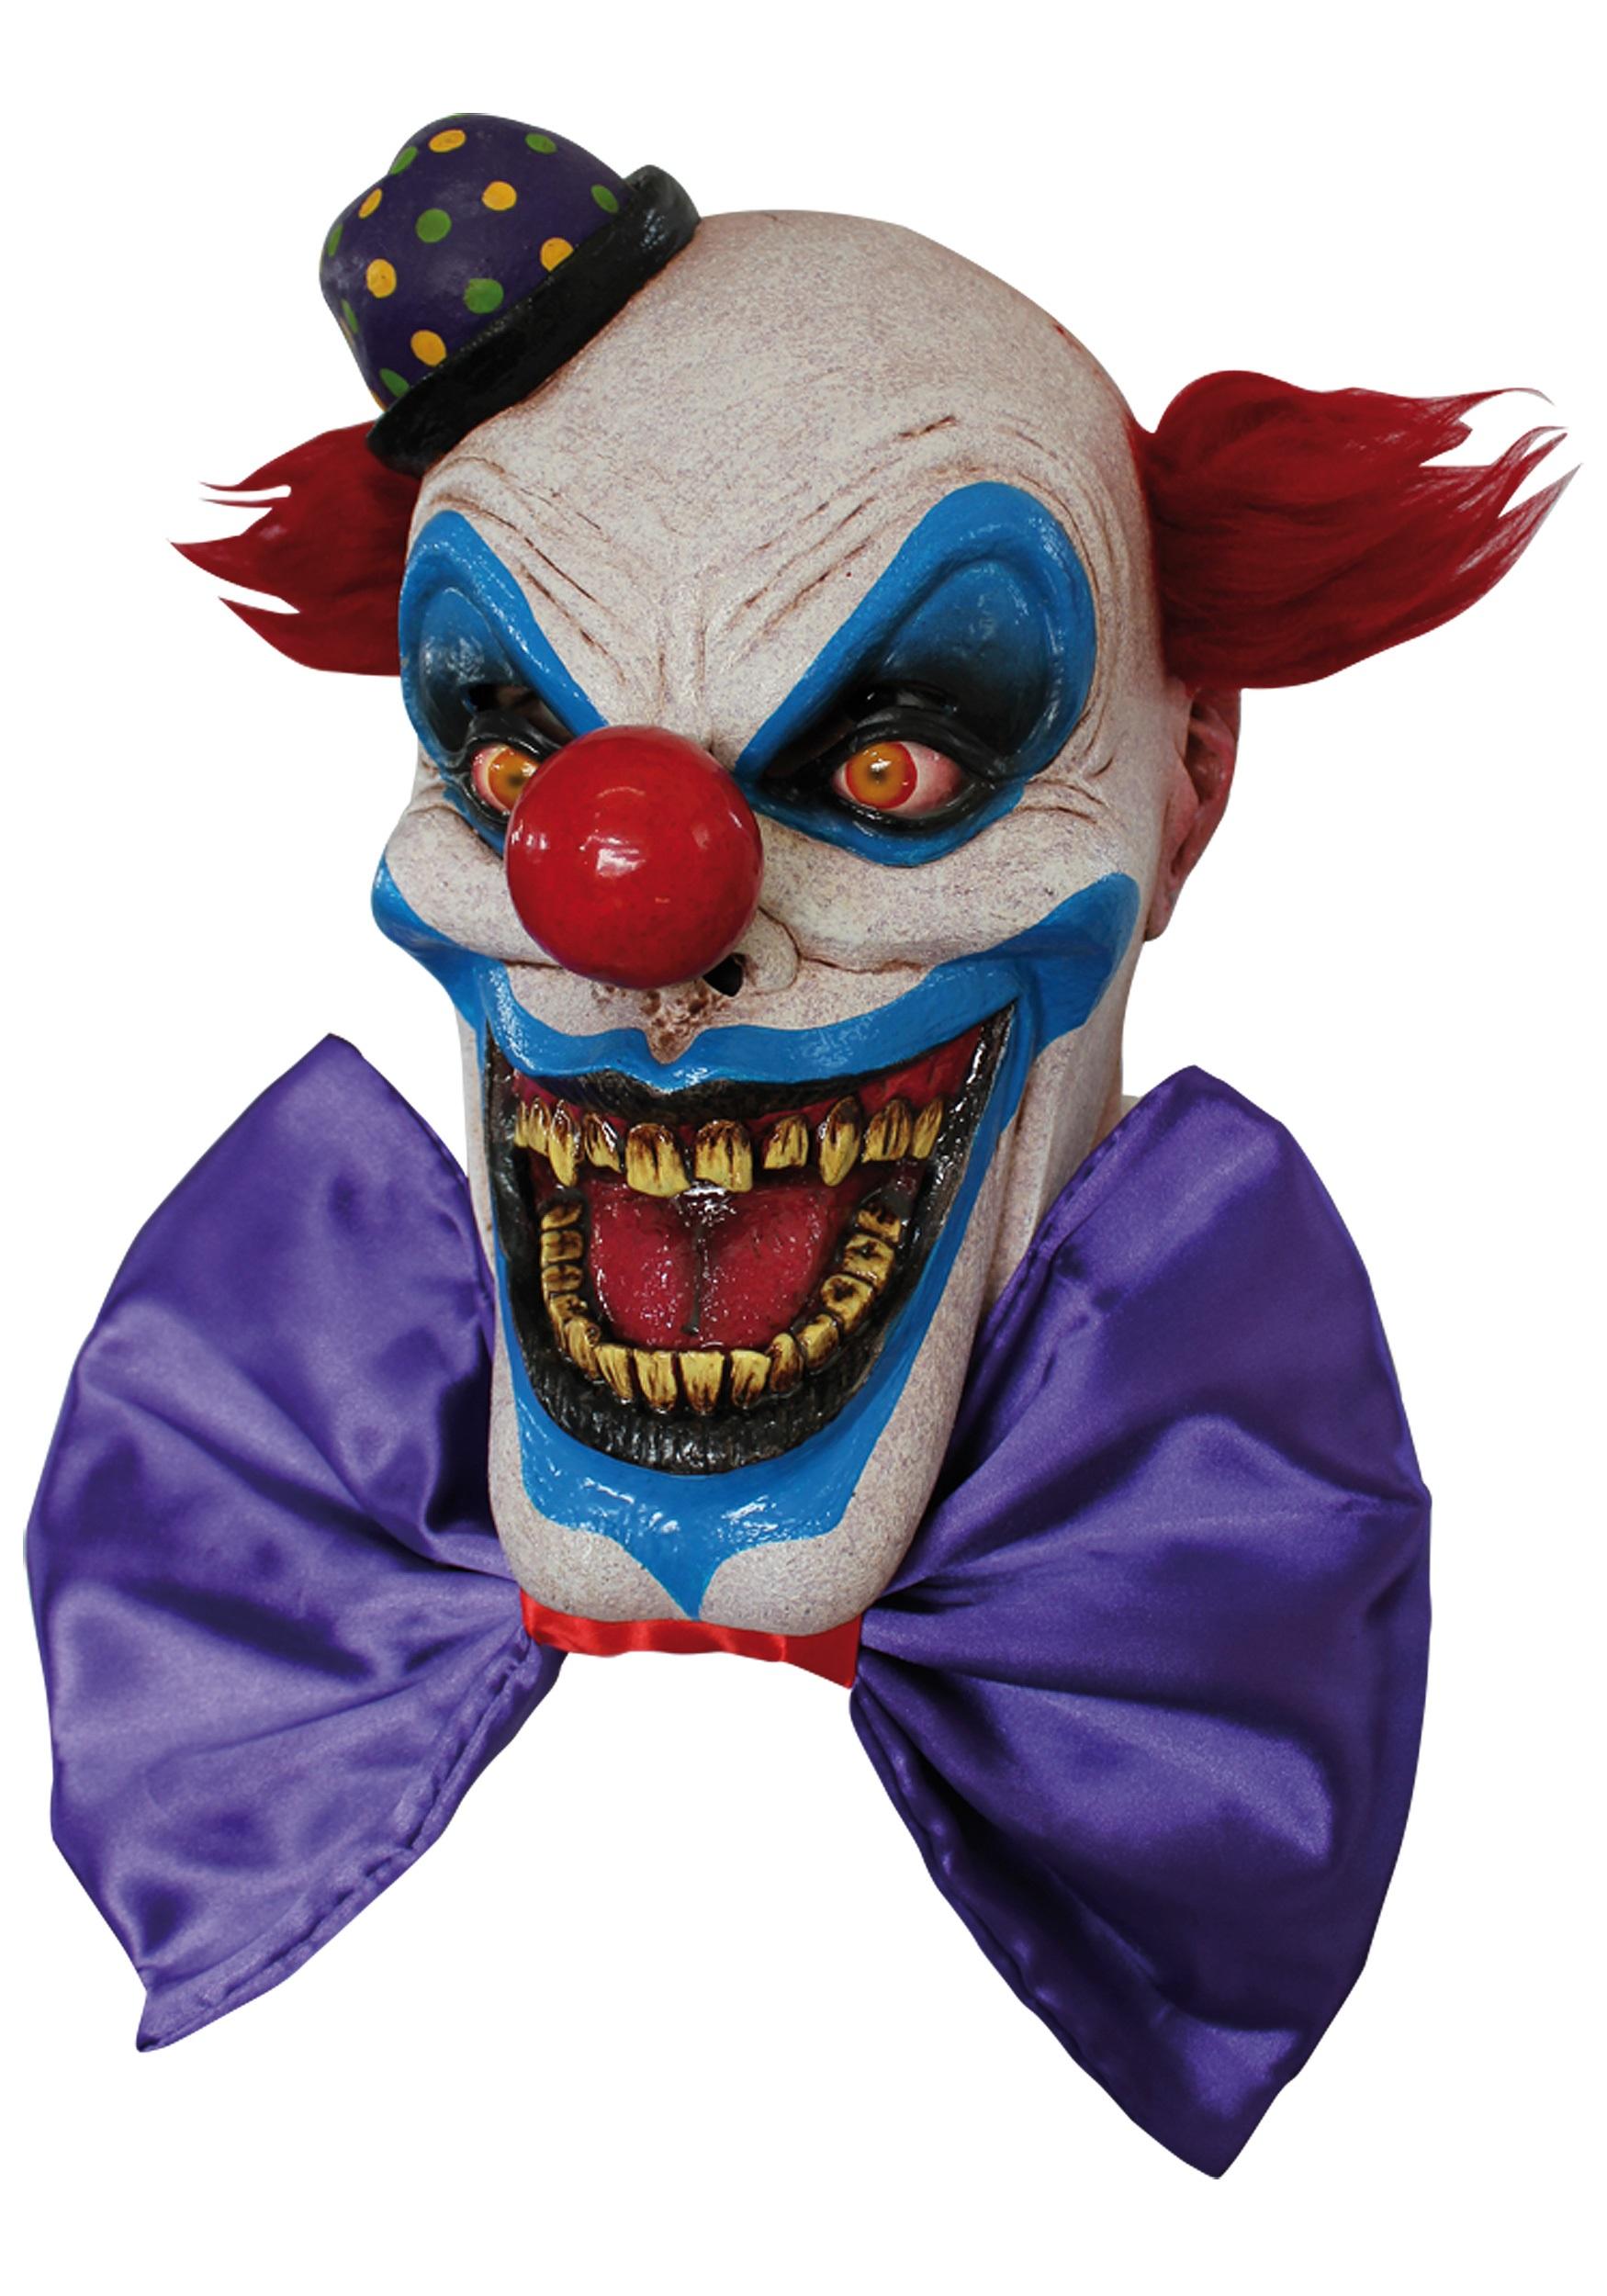 Payaso Maldito Mascaras De Halloween Mask Halloween Evil Clown Mask